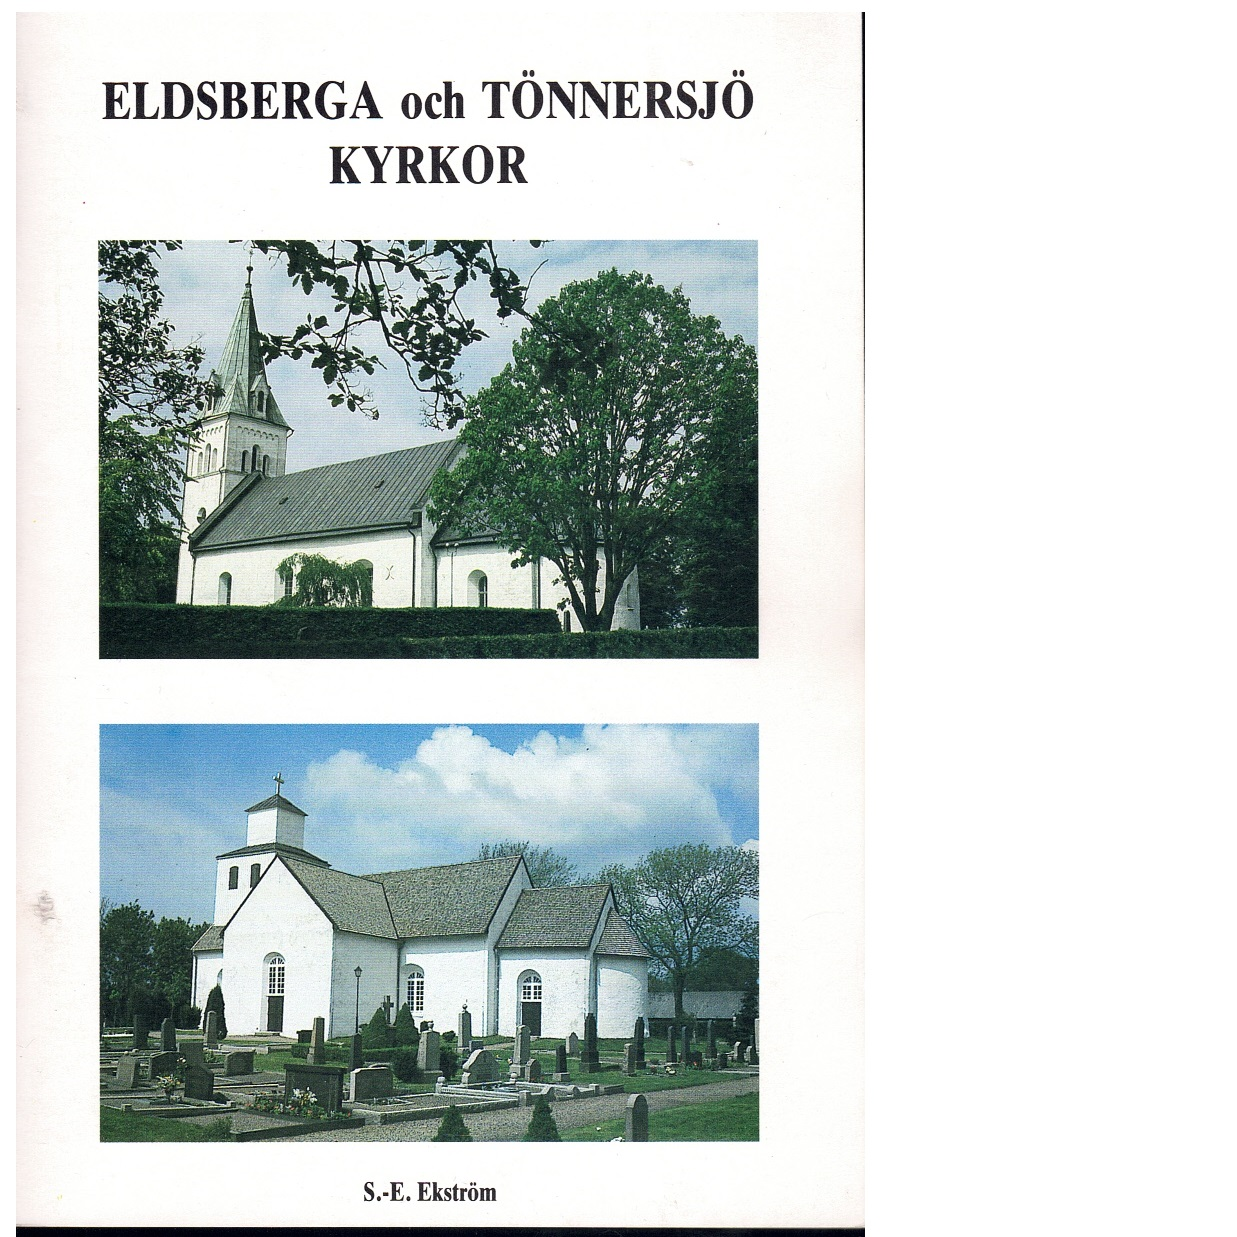 Eldsberga och Tönnersjö kyrkor - Ekström, Sven-erik